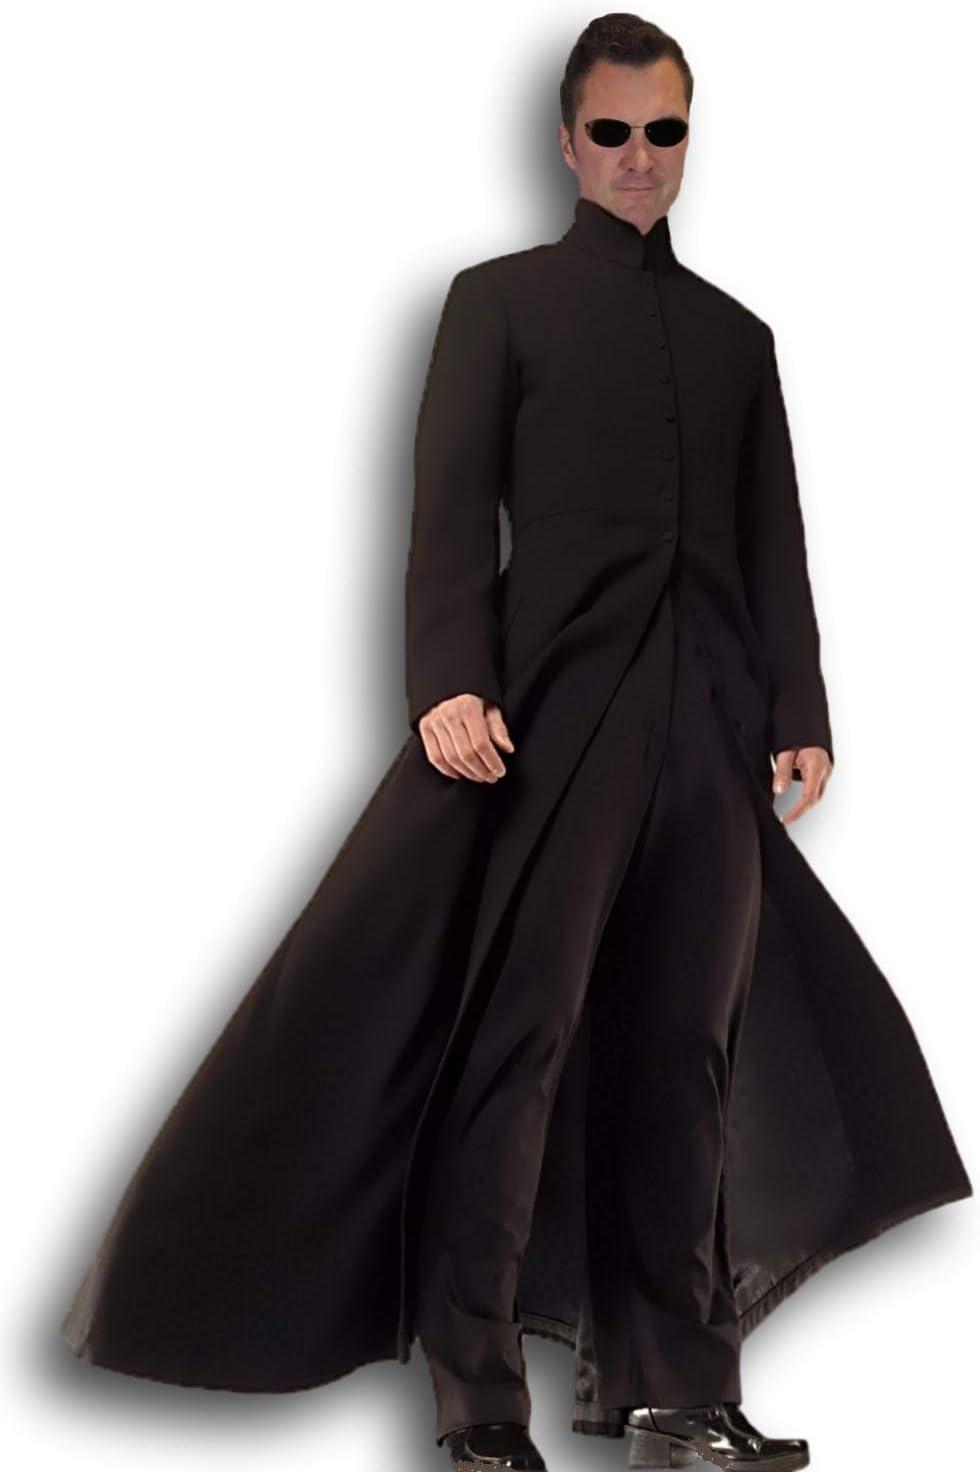 Rubber Johnnies TM Hombre Cybe Disfraz para Hombre The Matrix Película Estilo Fancy Dress